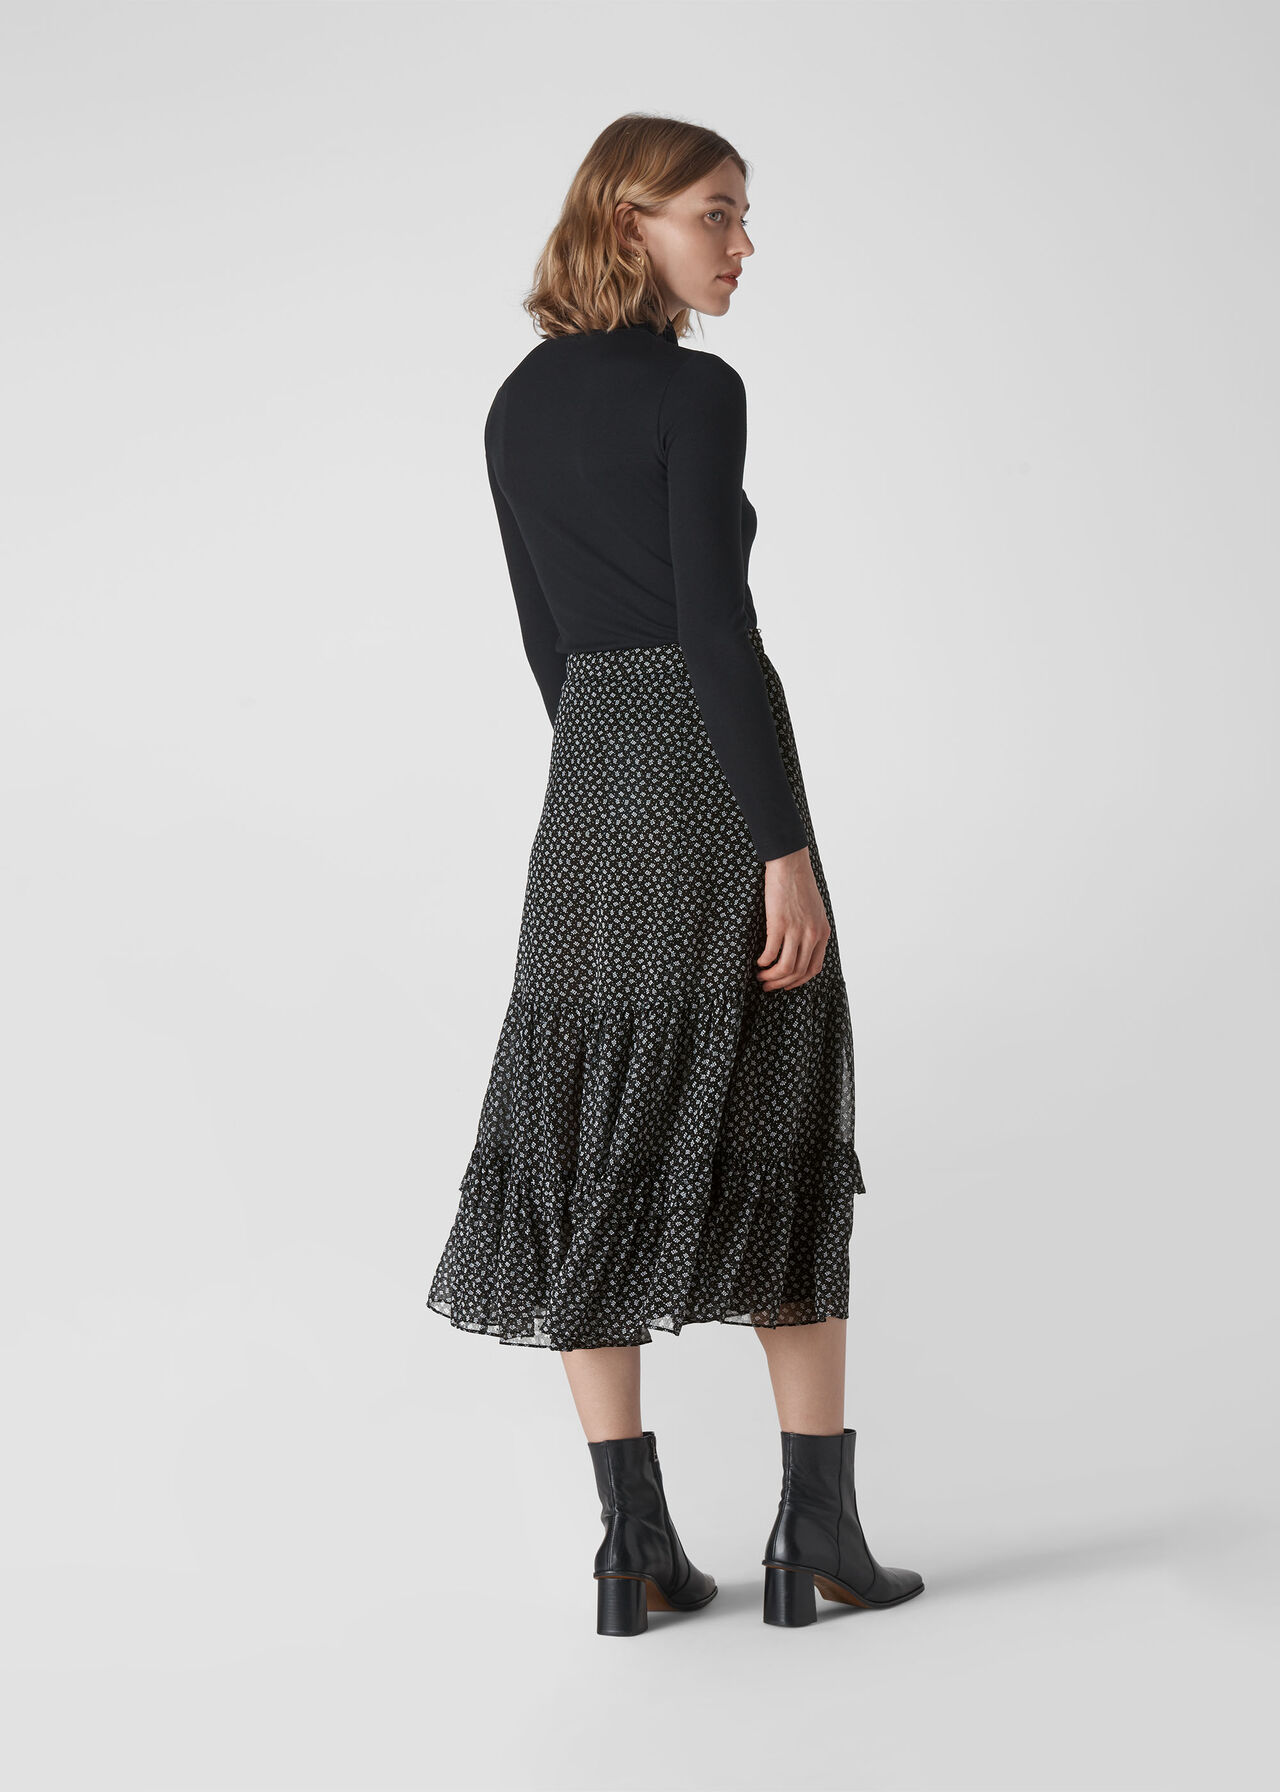 Almond Blossom Dobby Skirt Black/Multi